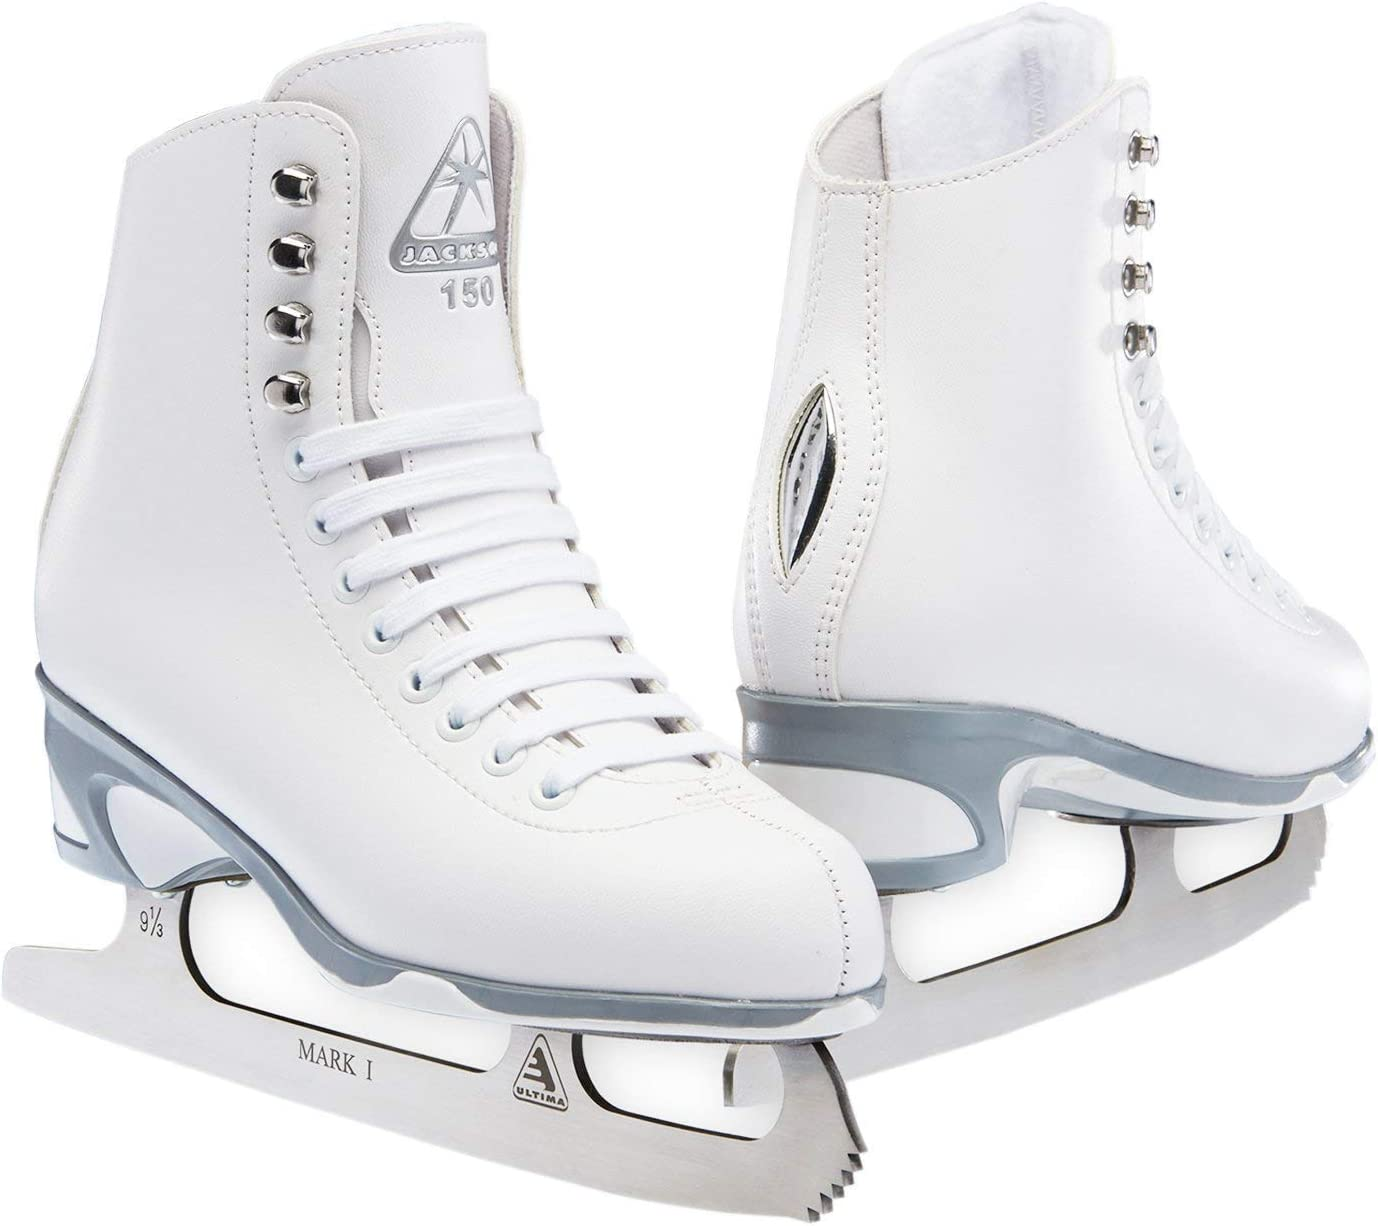 Jackson JS 154 SoftSkate 幼児用アイススケート靴 (サイズ 8)